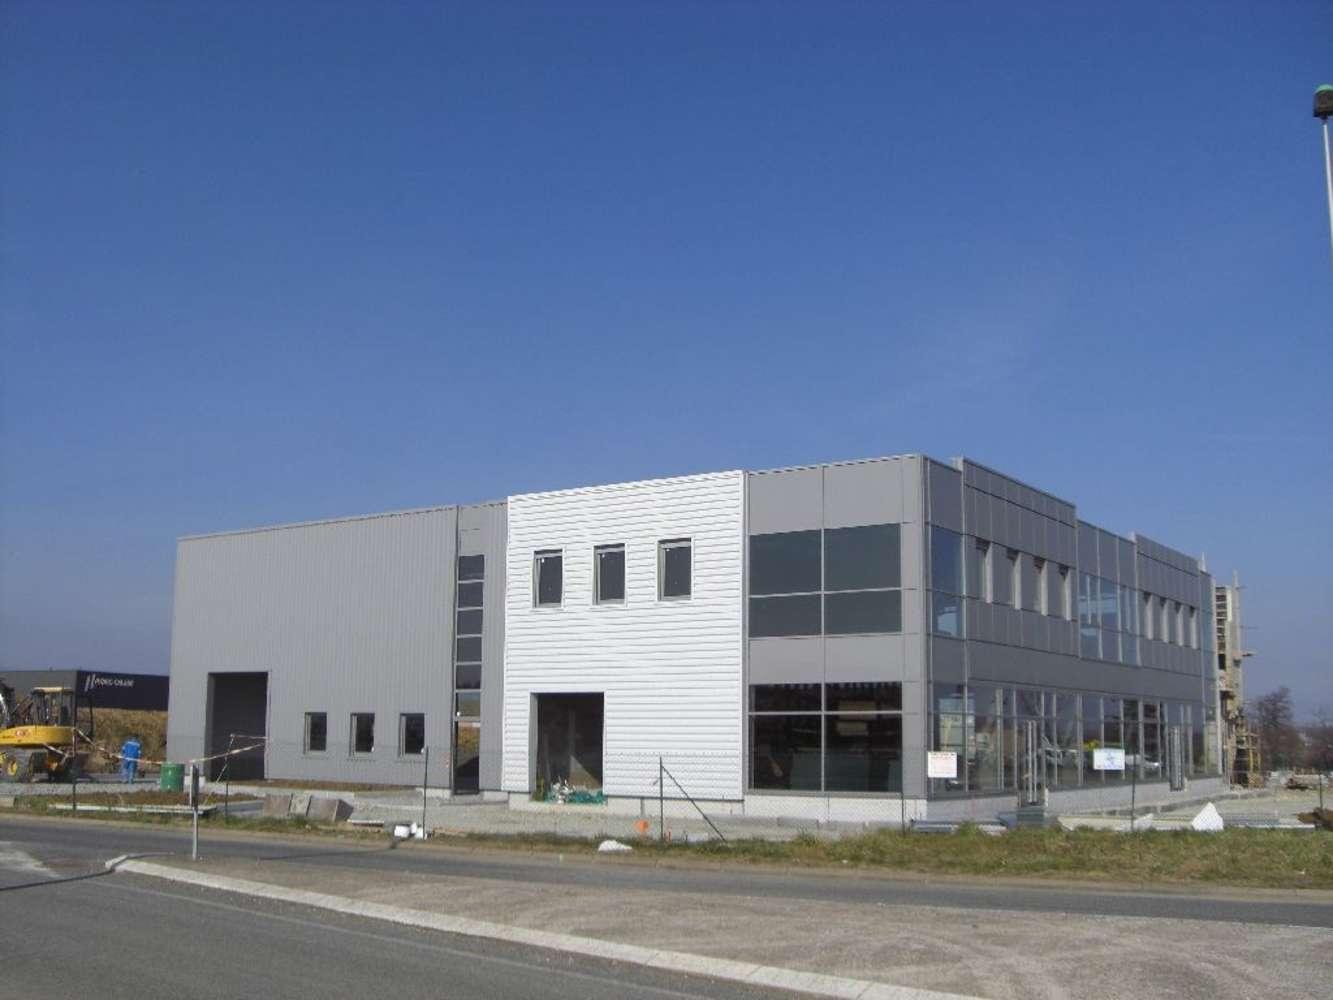 Activités/entrepôt Arnas, 69400 - Local d'activité à louer - Arnas (69) - 10021057